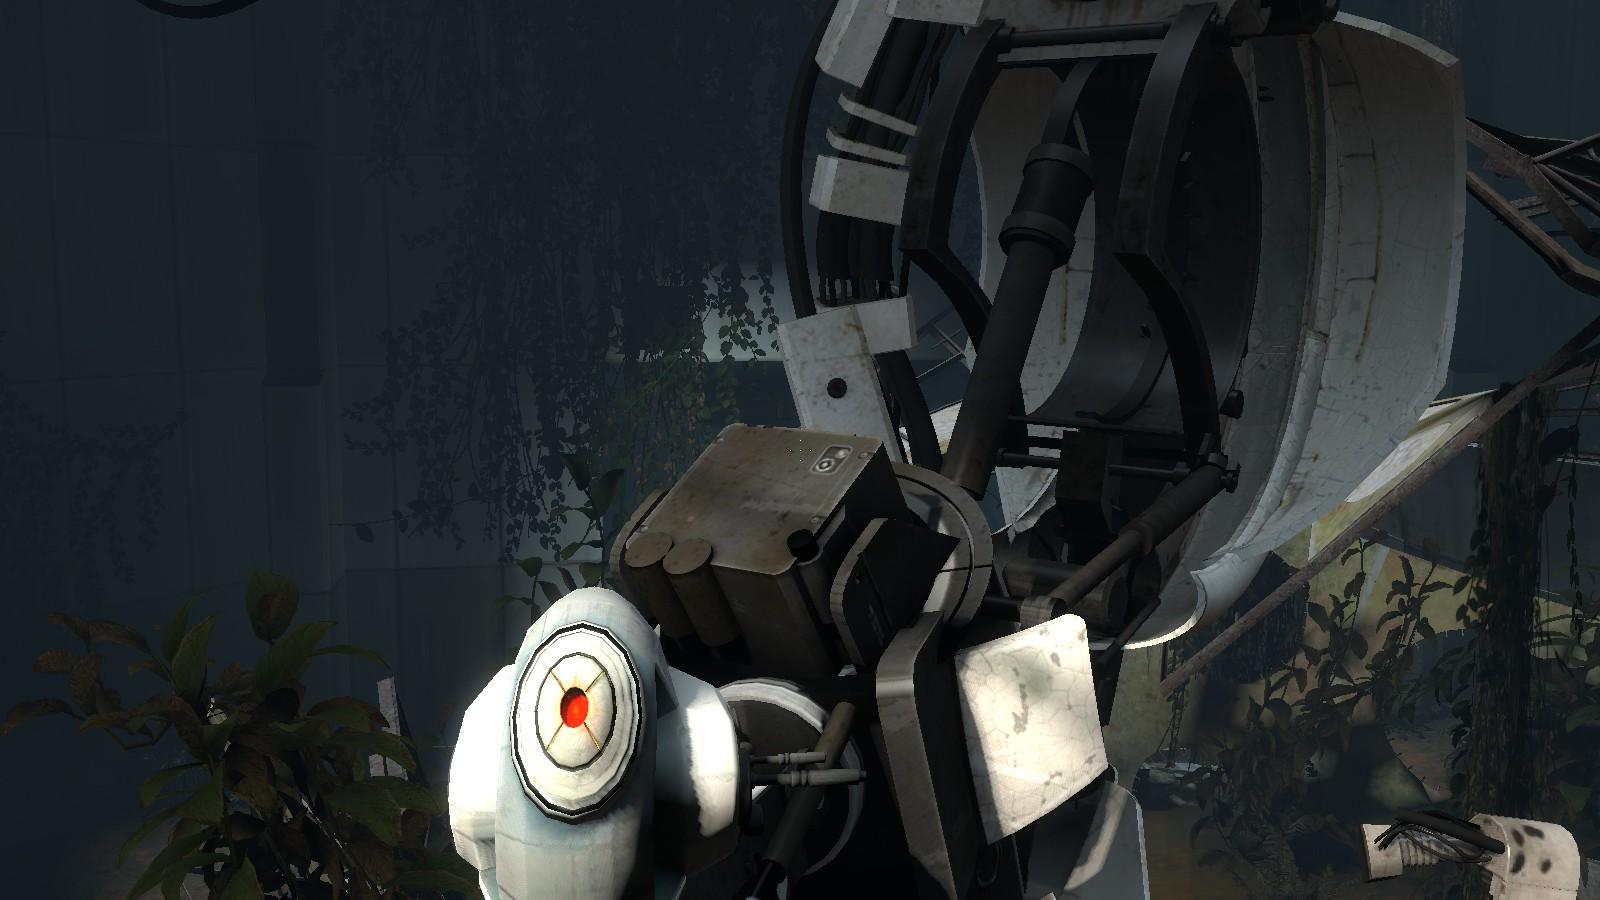 Glados Concept Early Image Portal 2 Beta Mod For Portal